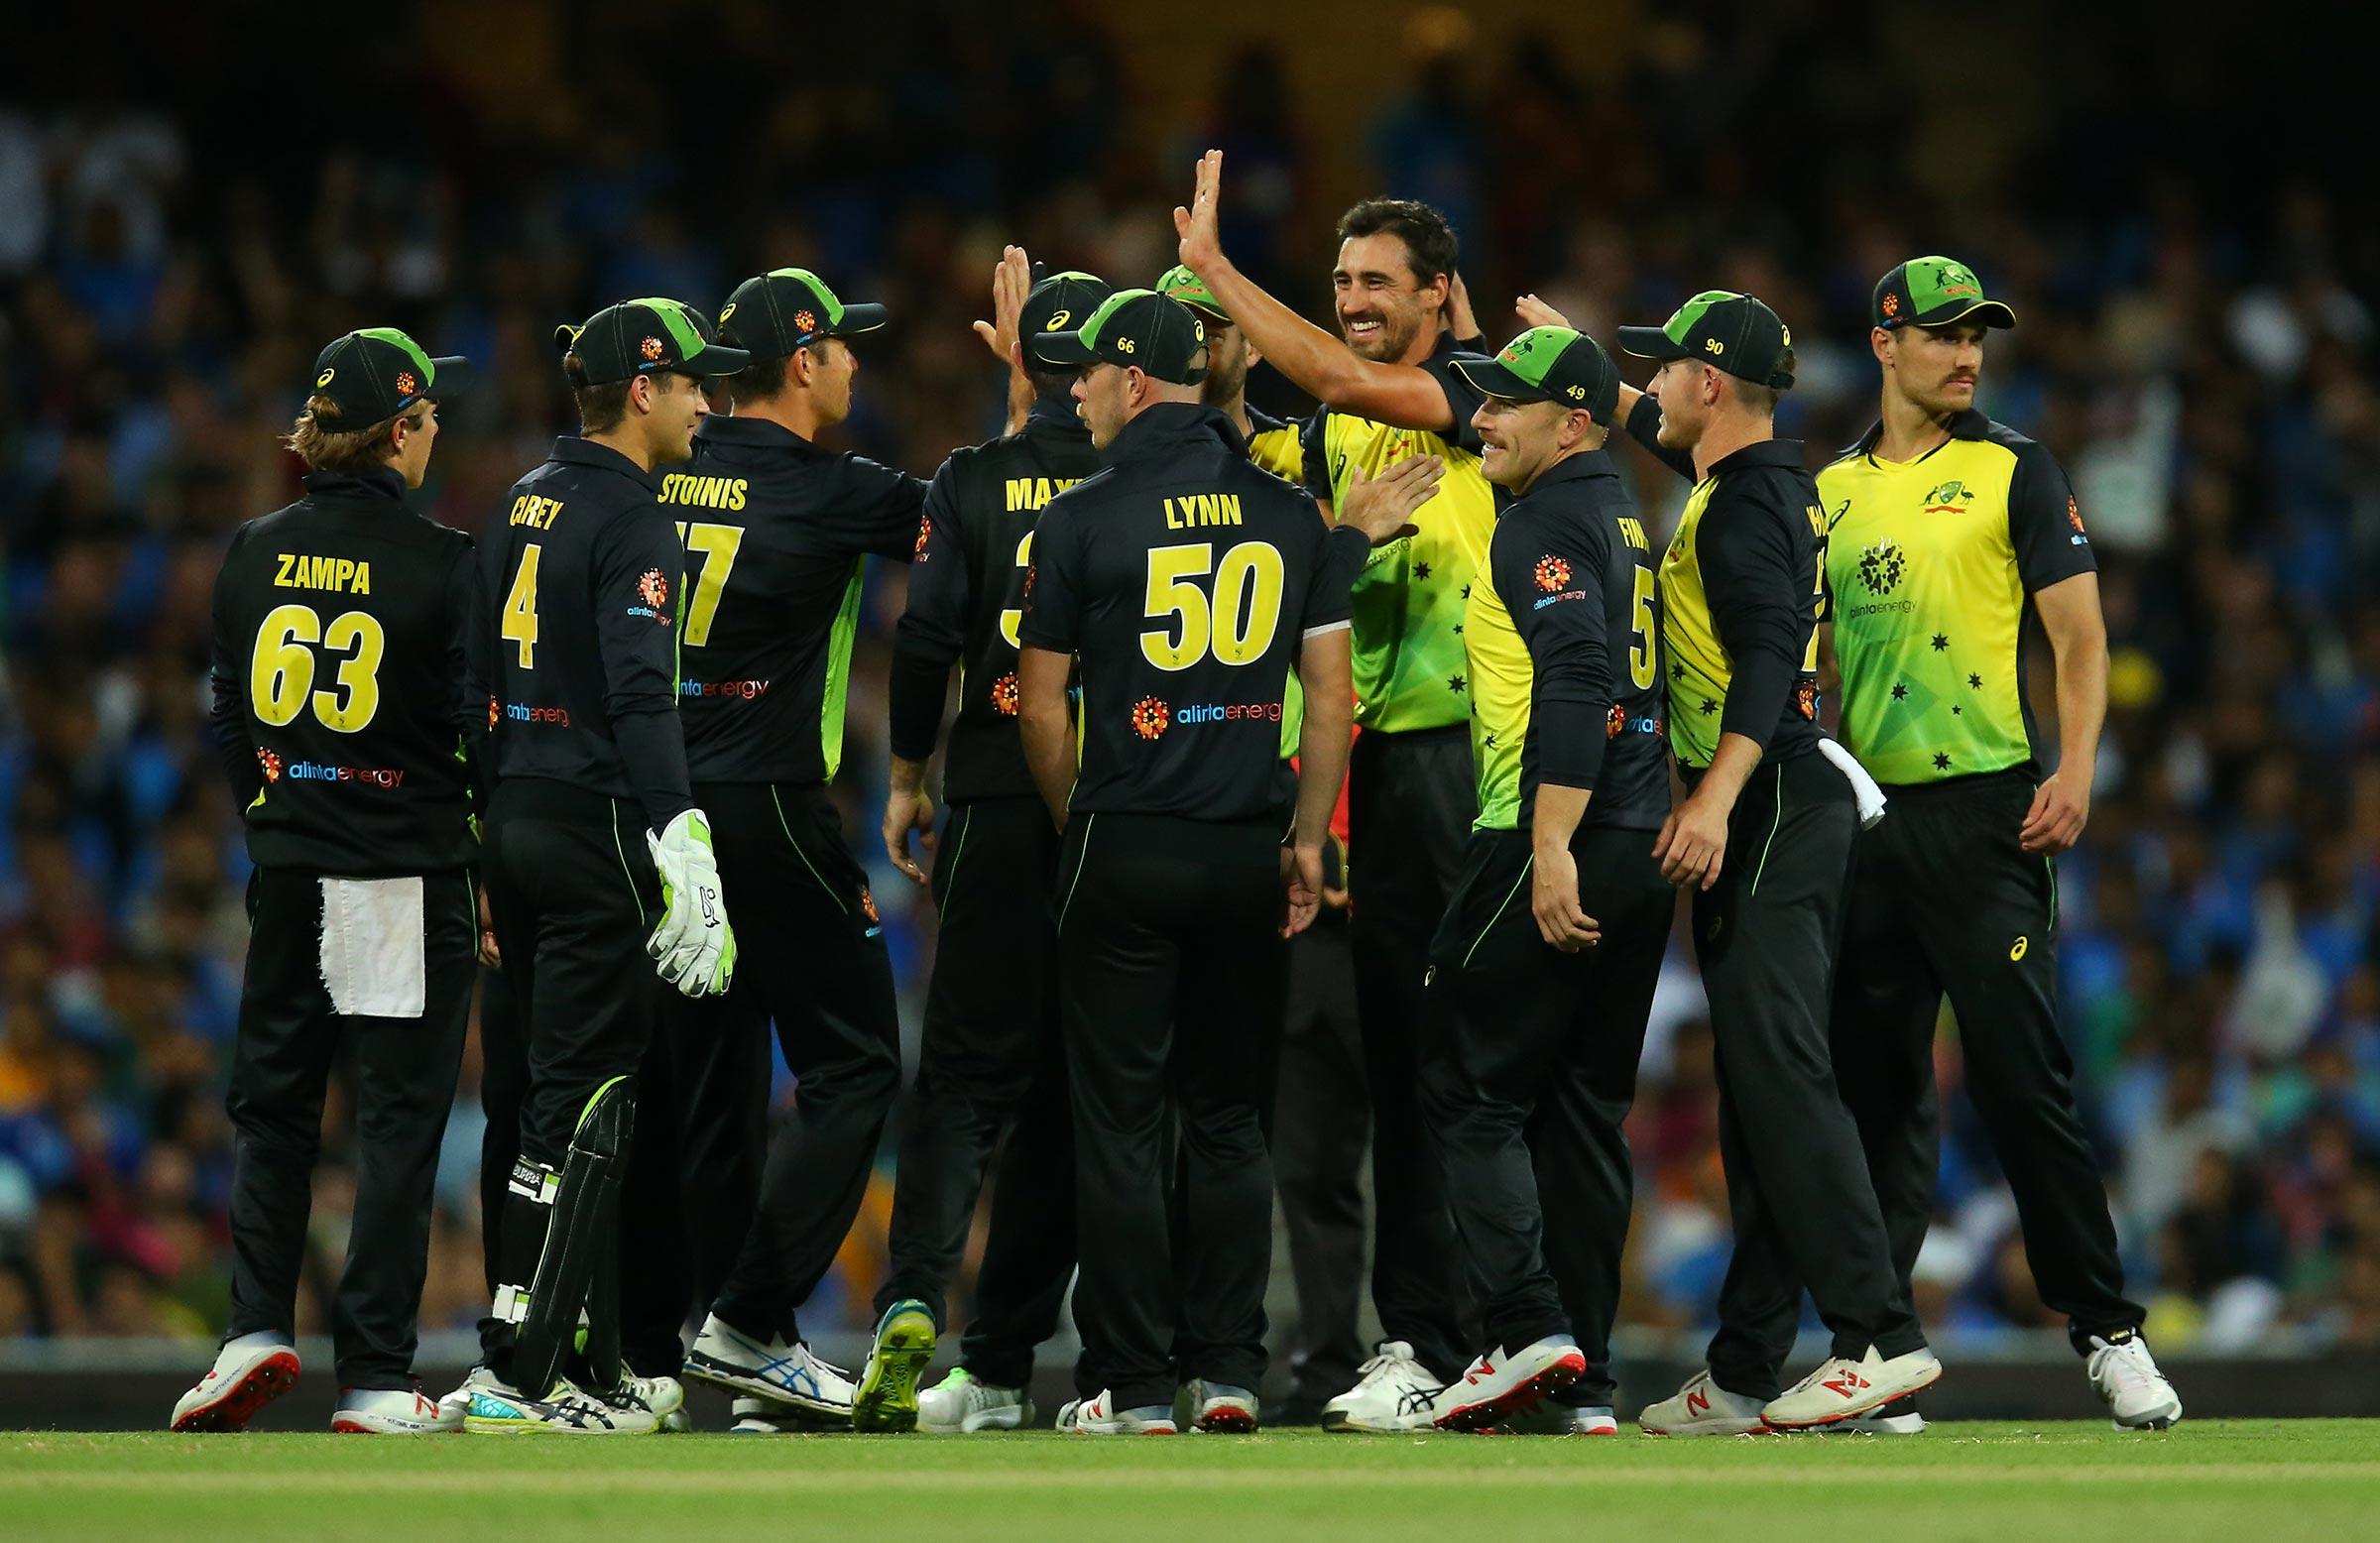 Australia will begin their tournament at the SCG // Getty